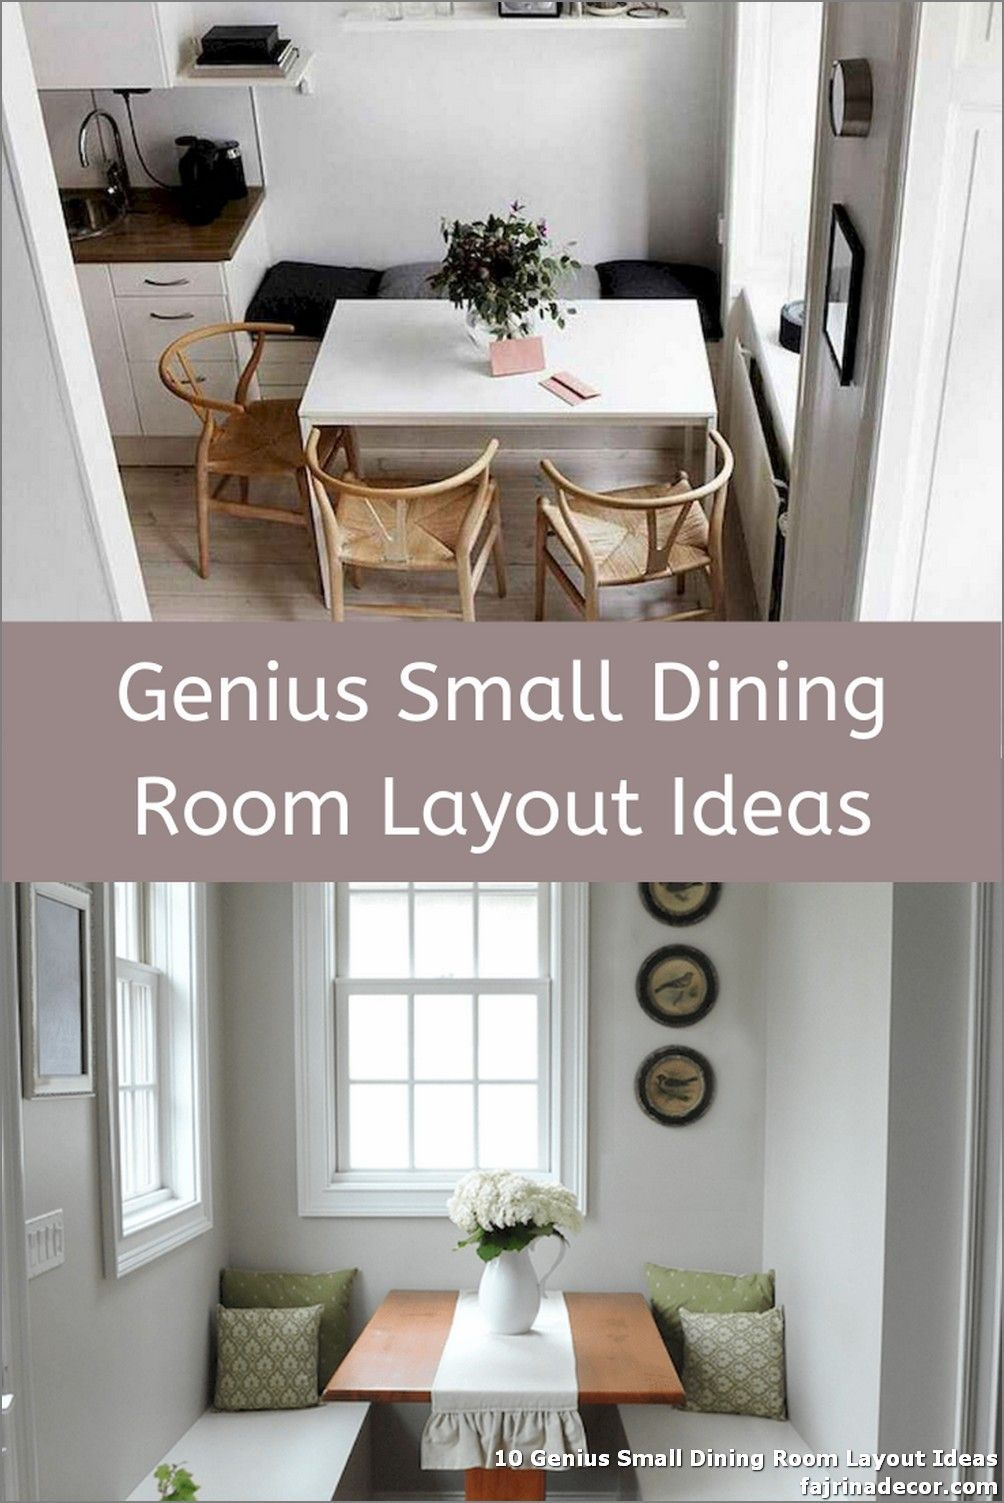 10 Genius Small Dining Room Layout Ideas 10 Genius Small Dining Room Layout Ideas Even When Your Eating Ro In 2020 Dining Room Small Dining Room Layout Small Dining